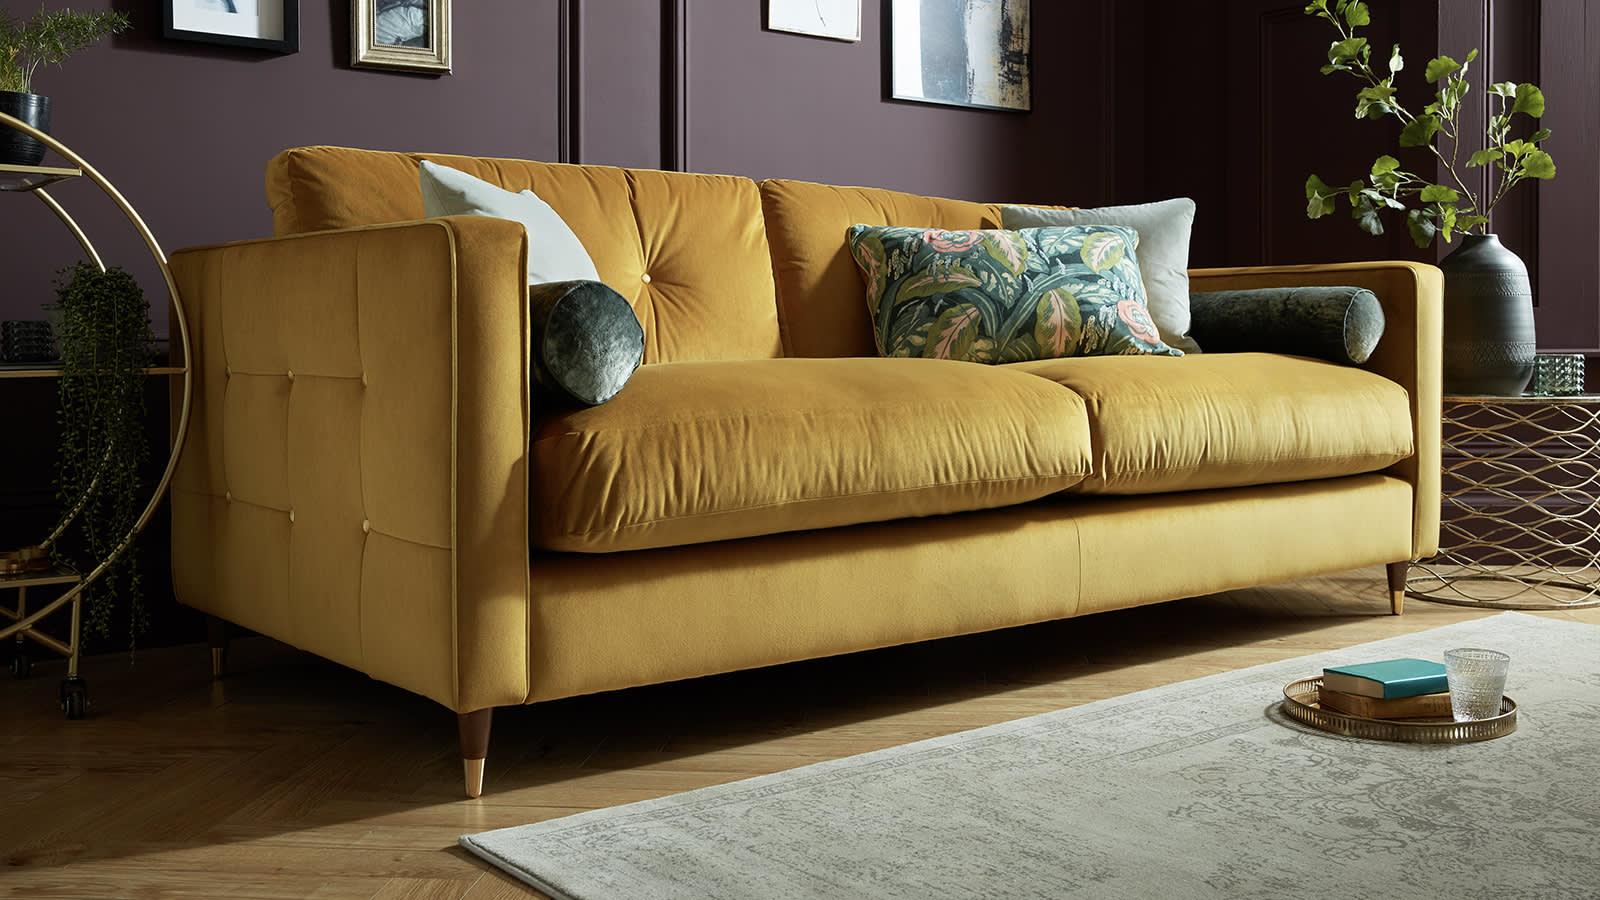 Sofology Clerkenwell Sofa